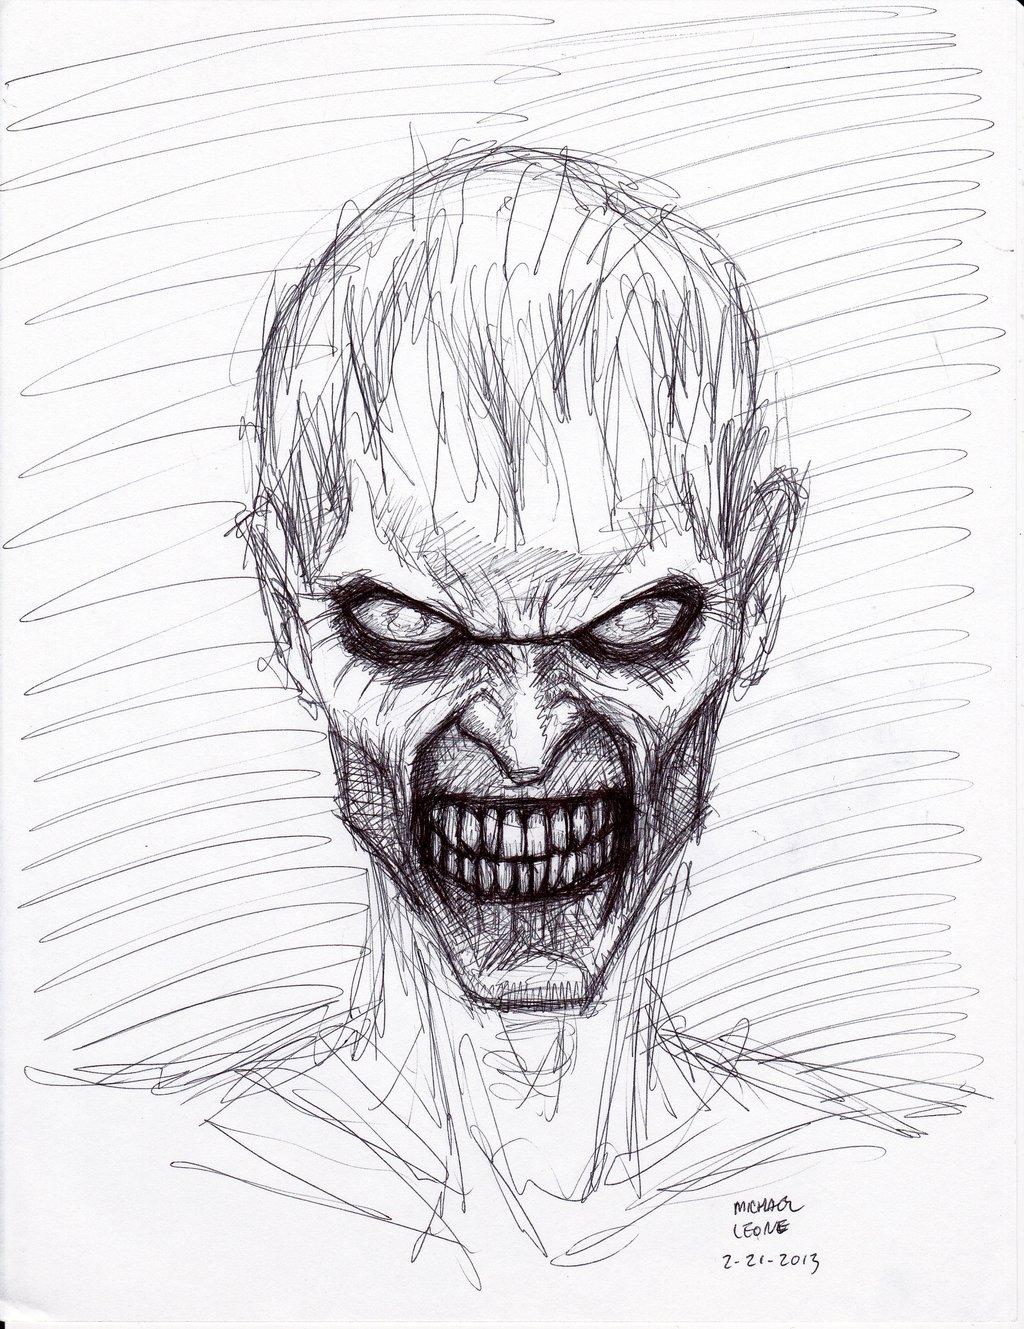 1024x1329 Zombie+Drawings+in+Pencil zombie pen sketch 2 21 2013 by